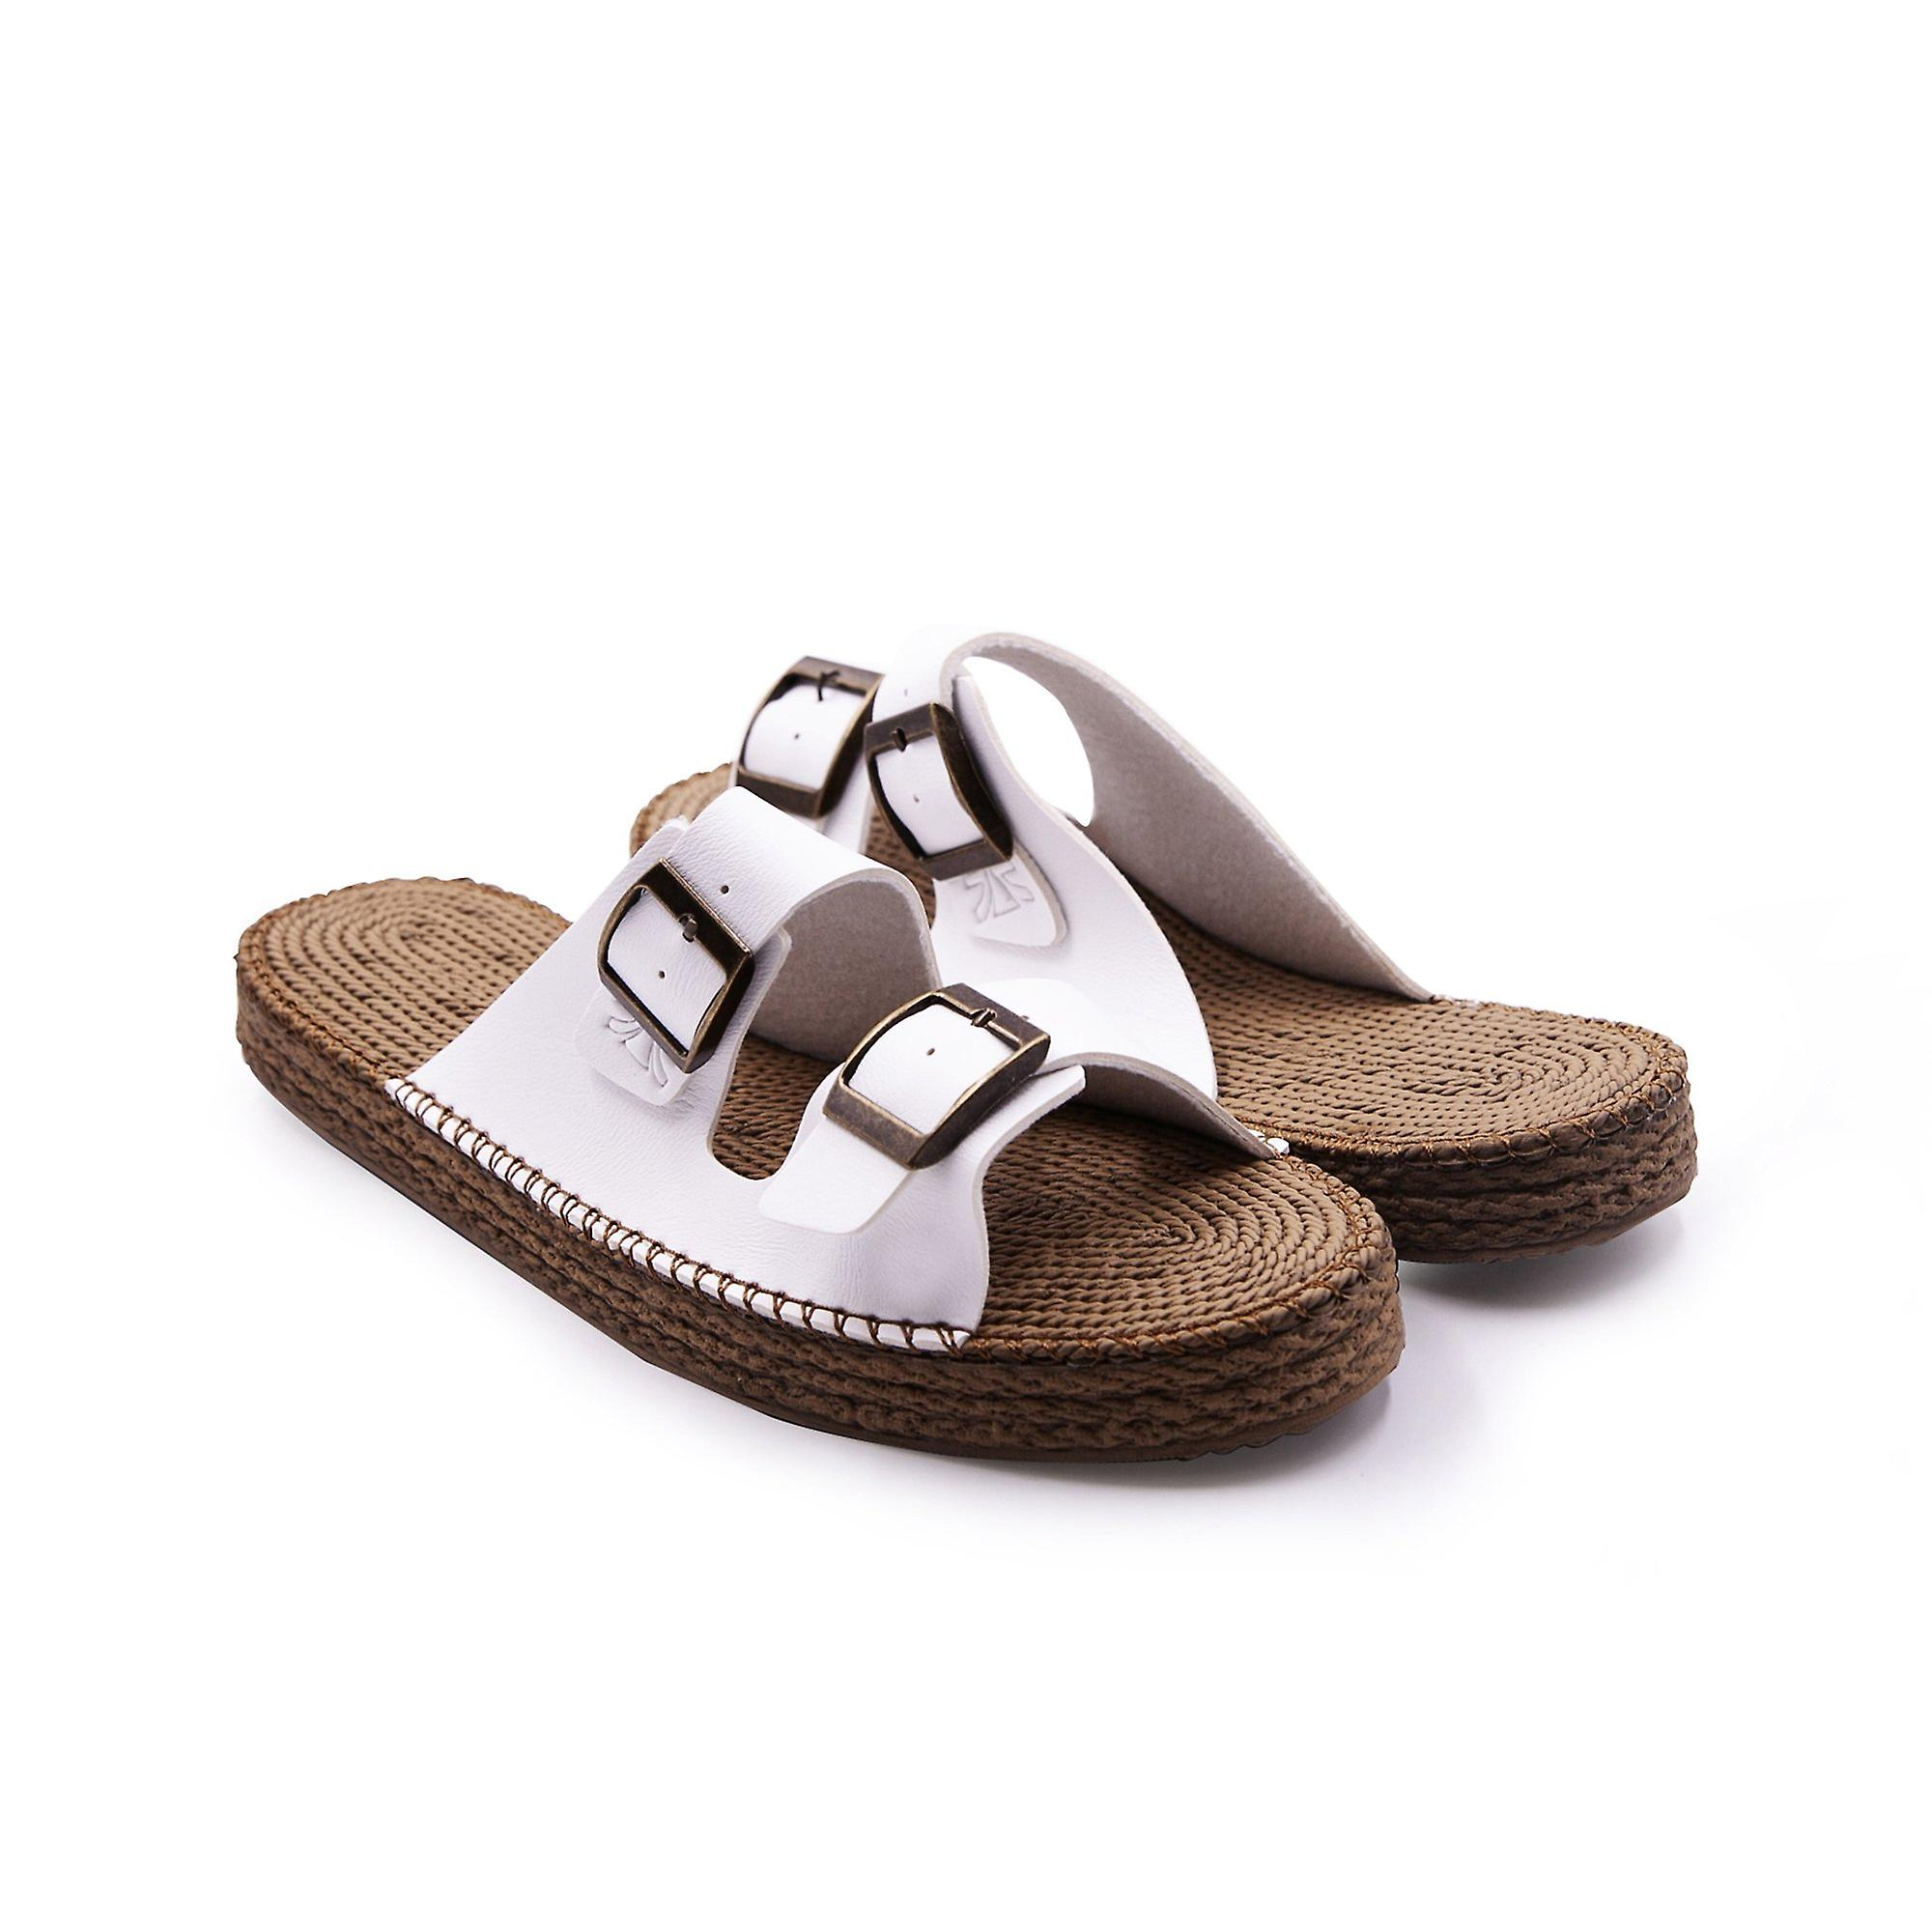 Sunday morning white sandals